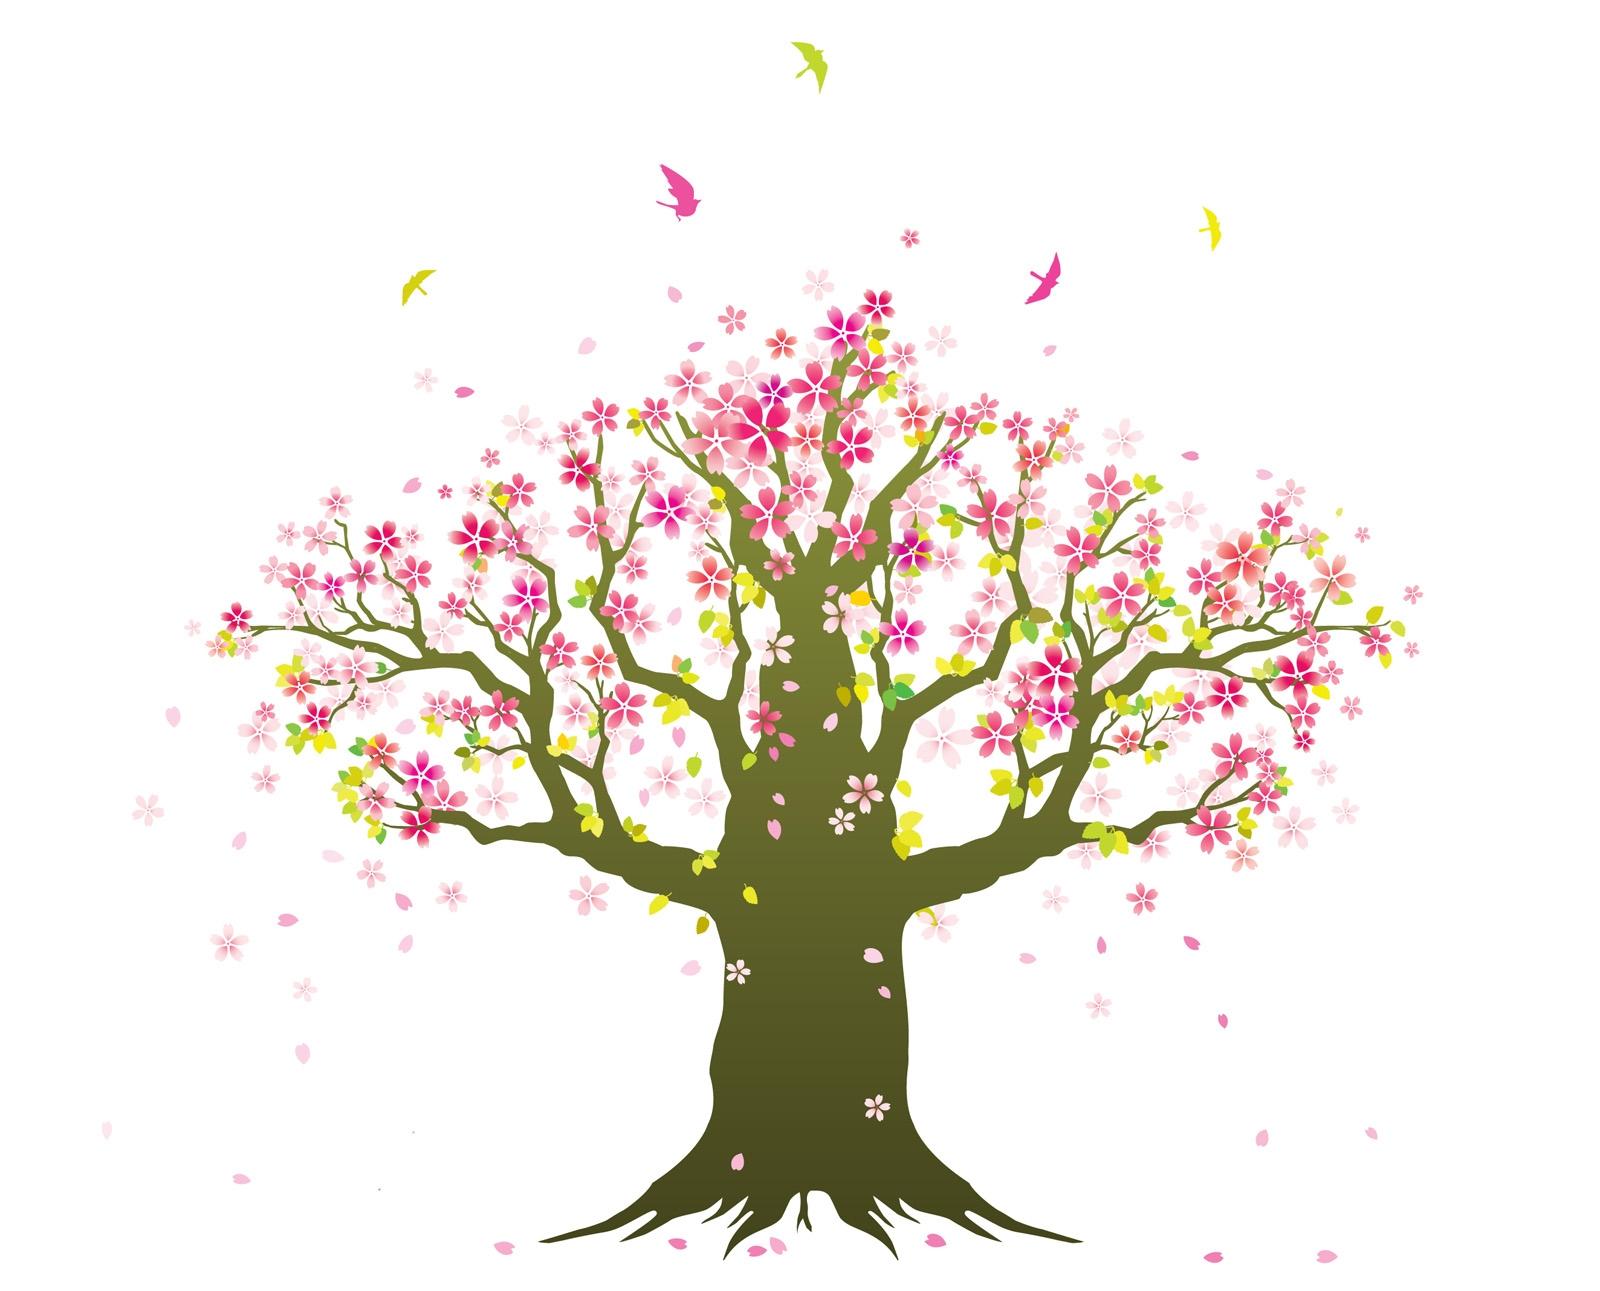 tree of strengths